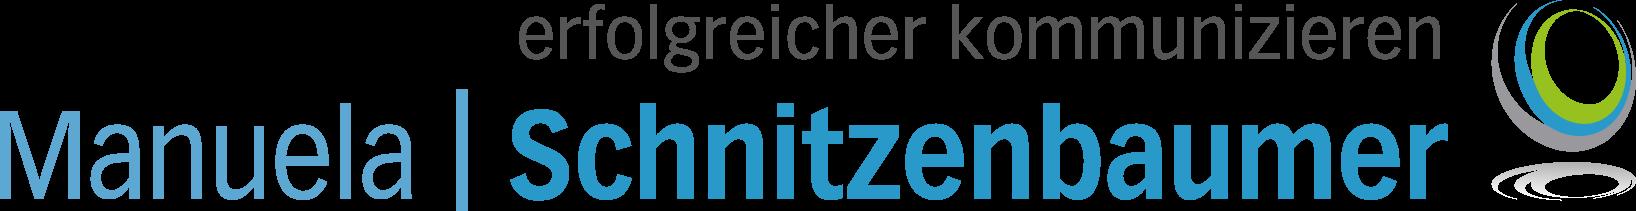 https://erfolgreicher-kommunizieren.de/wp-content/uploads/2018/08/180717-Logo-Manuela-Schnitzenbaumer_2018-1.png